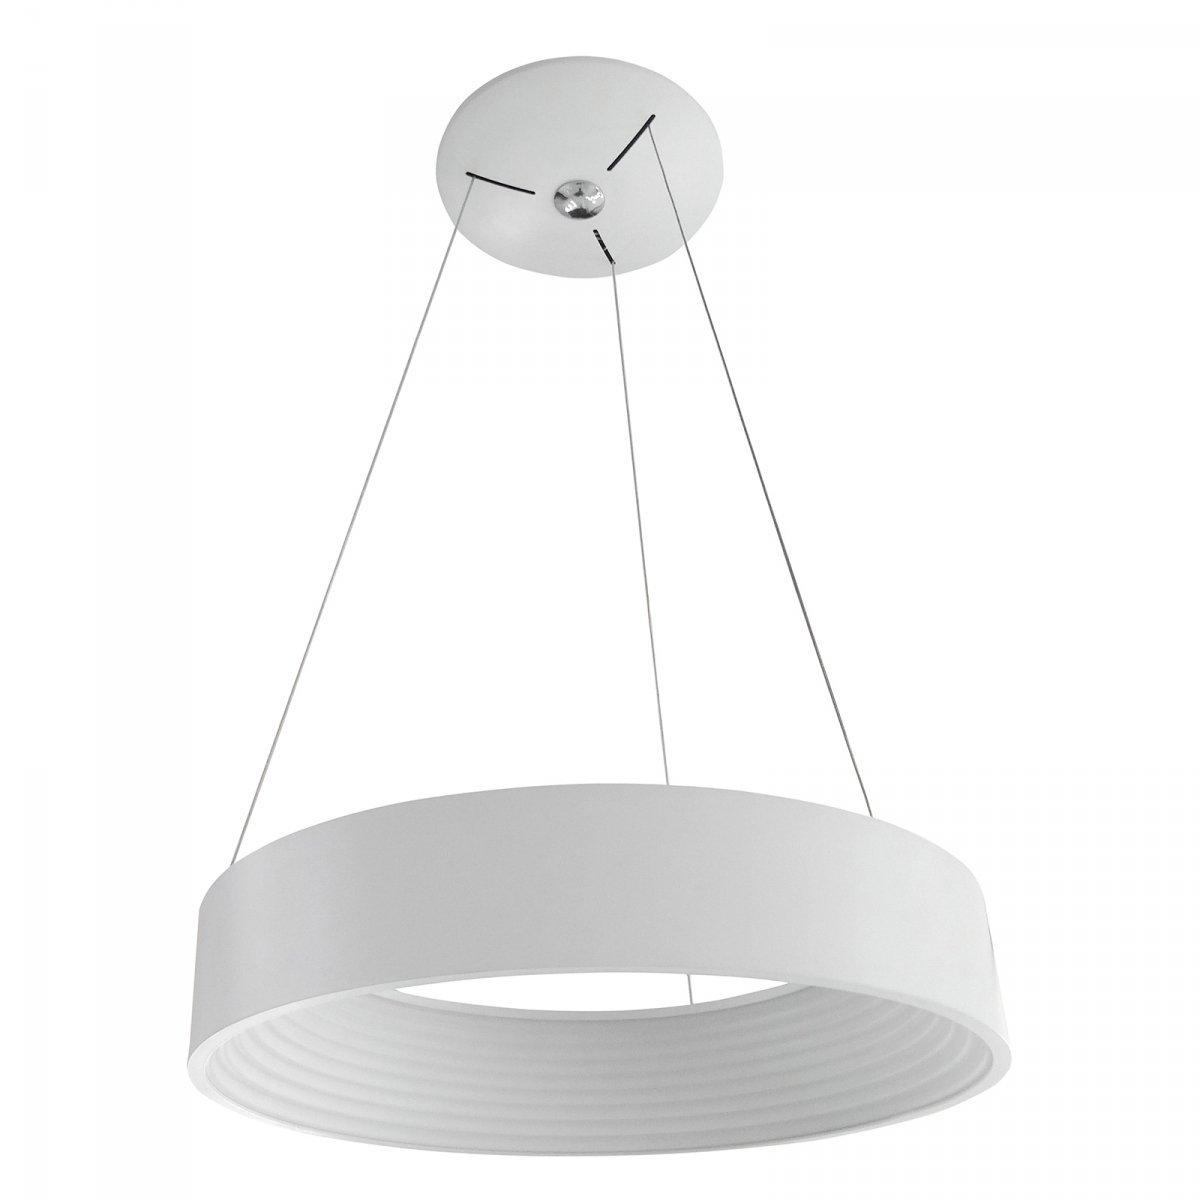 ITALUX MATTIA LAMPA WISZĄCA OKRĄGŁA LED 32W